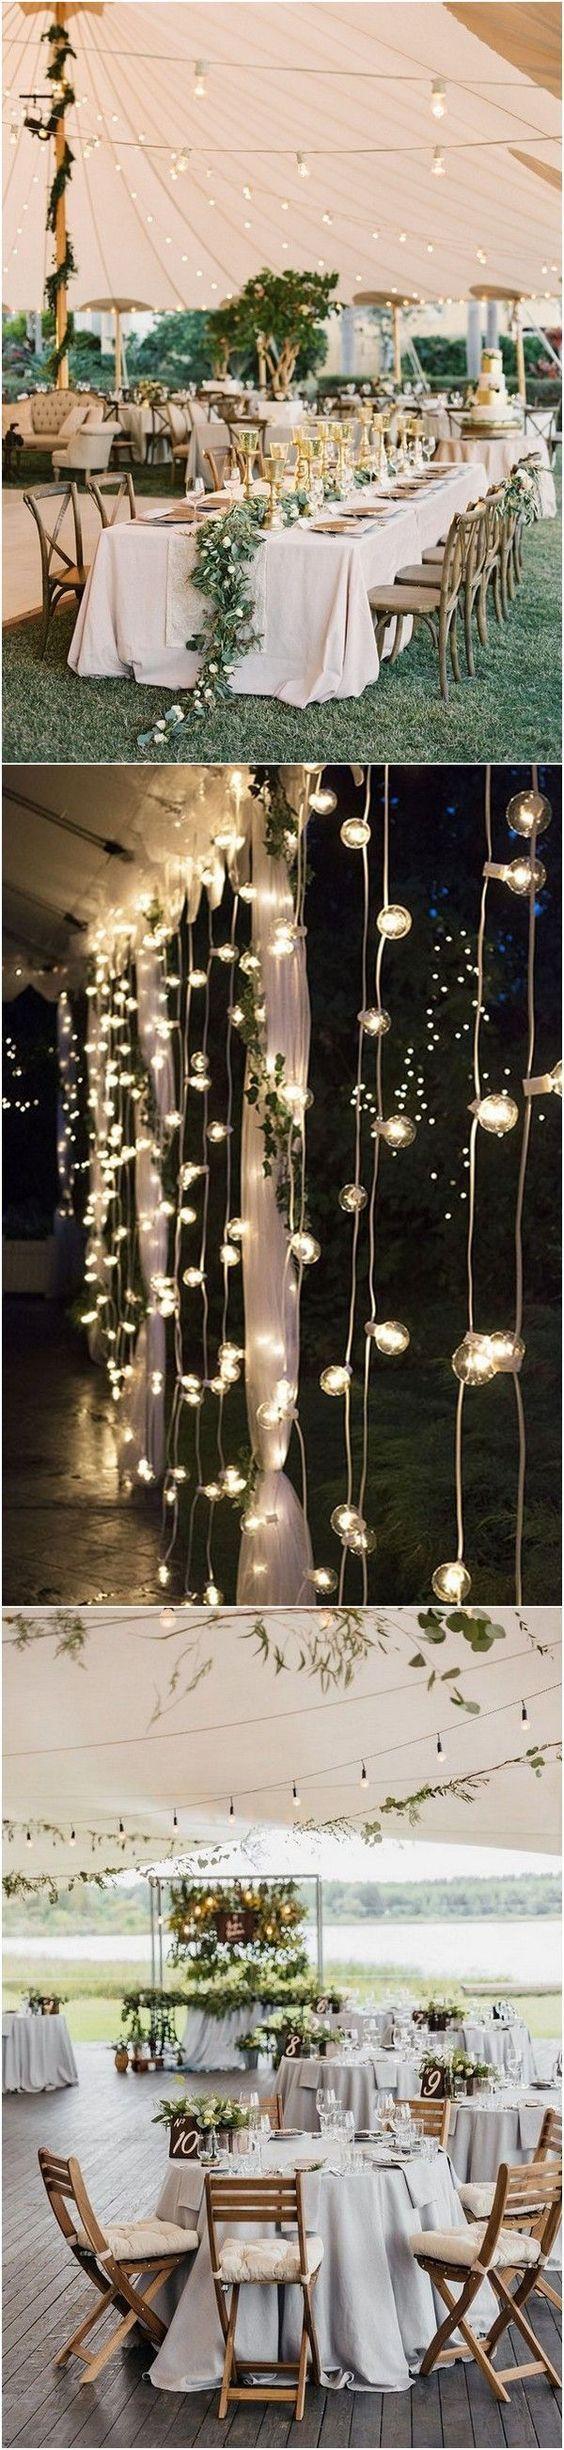 Wedding decorations wedding reception ideas  Trending Tented Wedding Reception Ideas Youull Love  Page  of